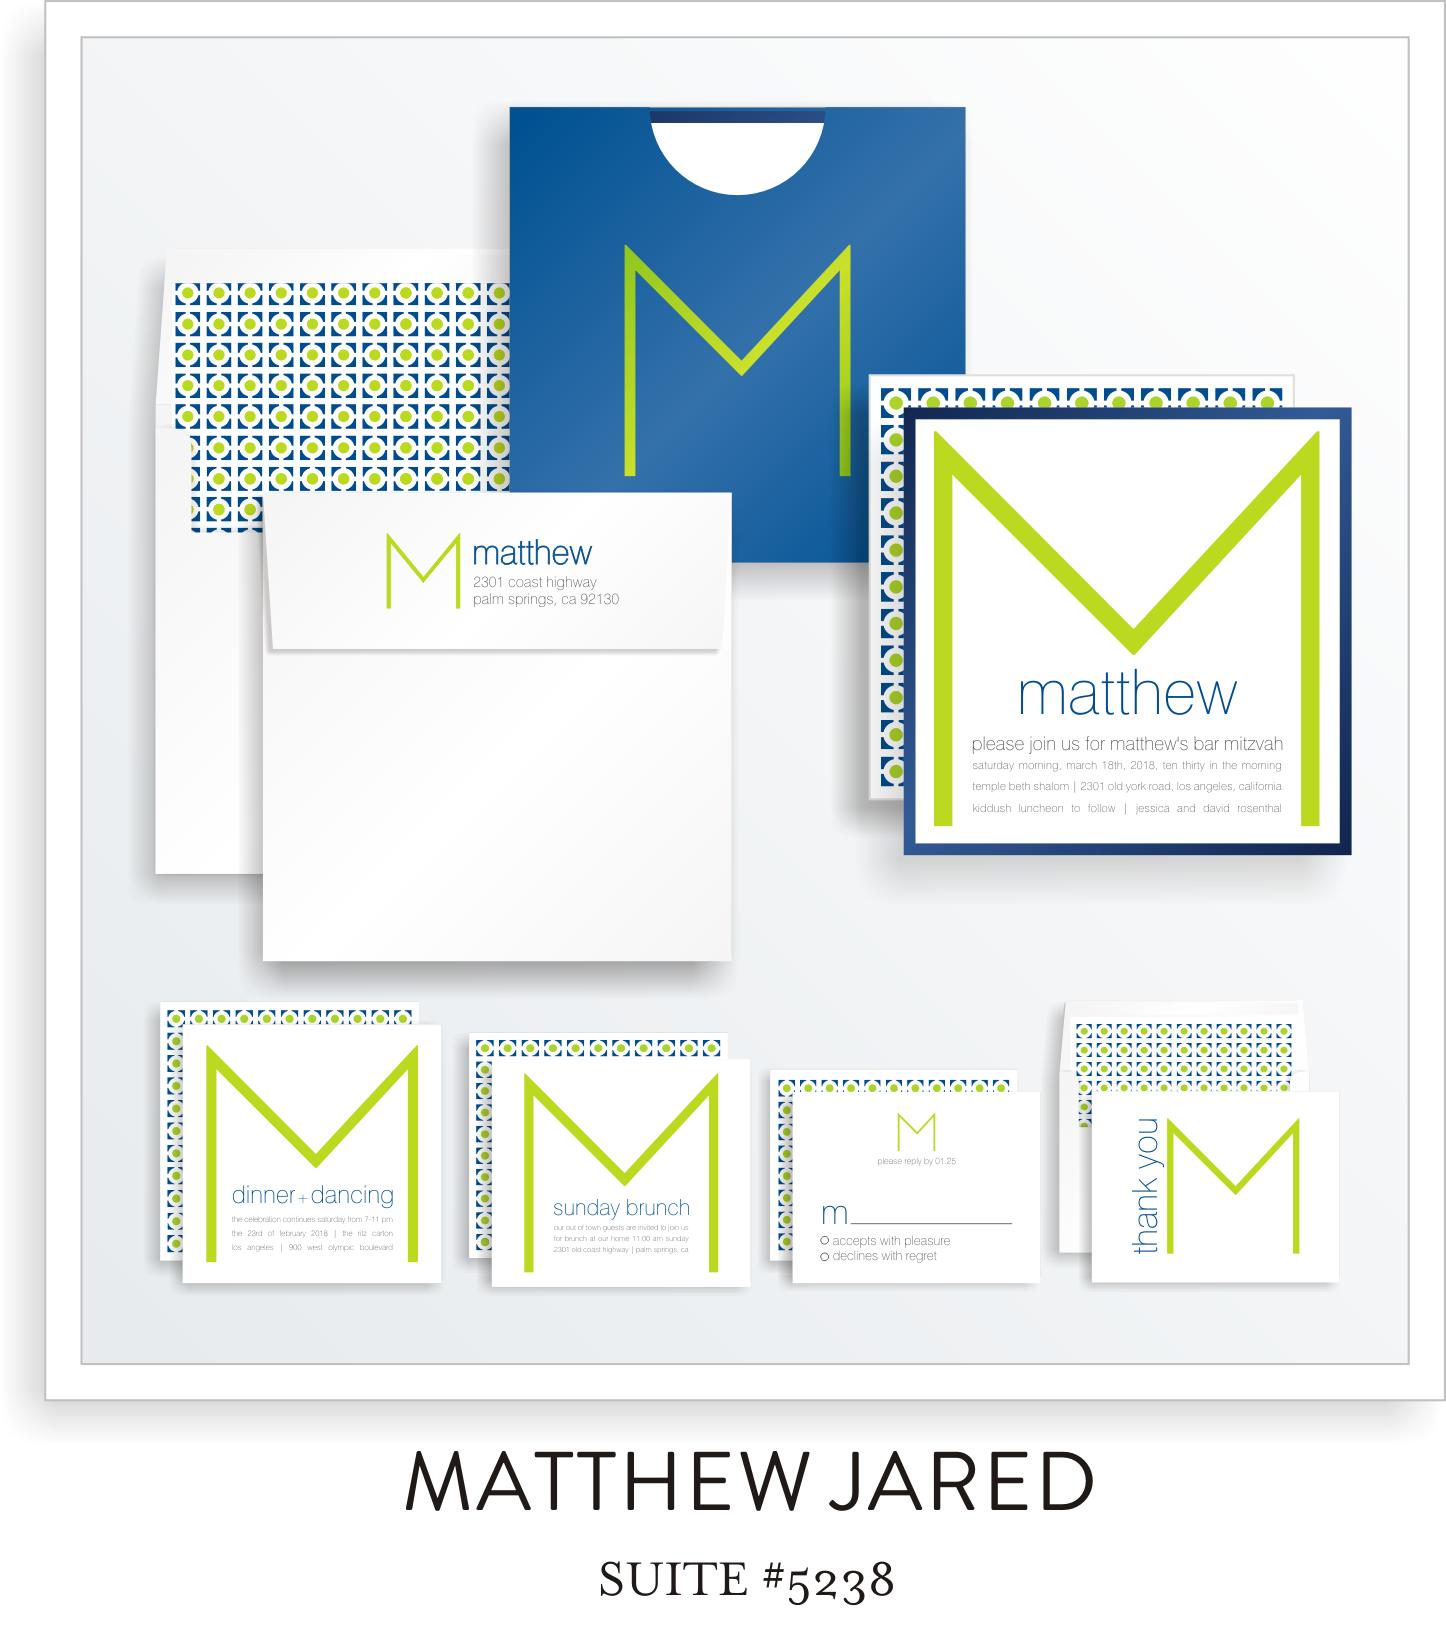 Copy of Copy of Bar Mitzvah Invitation Suite 5238 - Matthew Jared